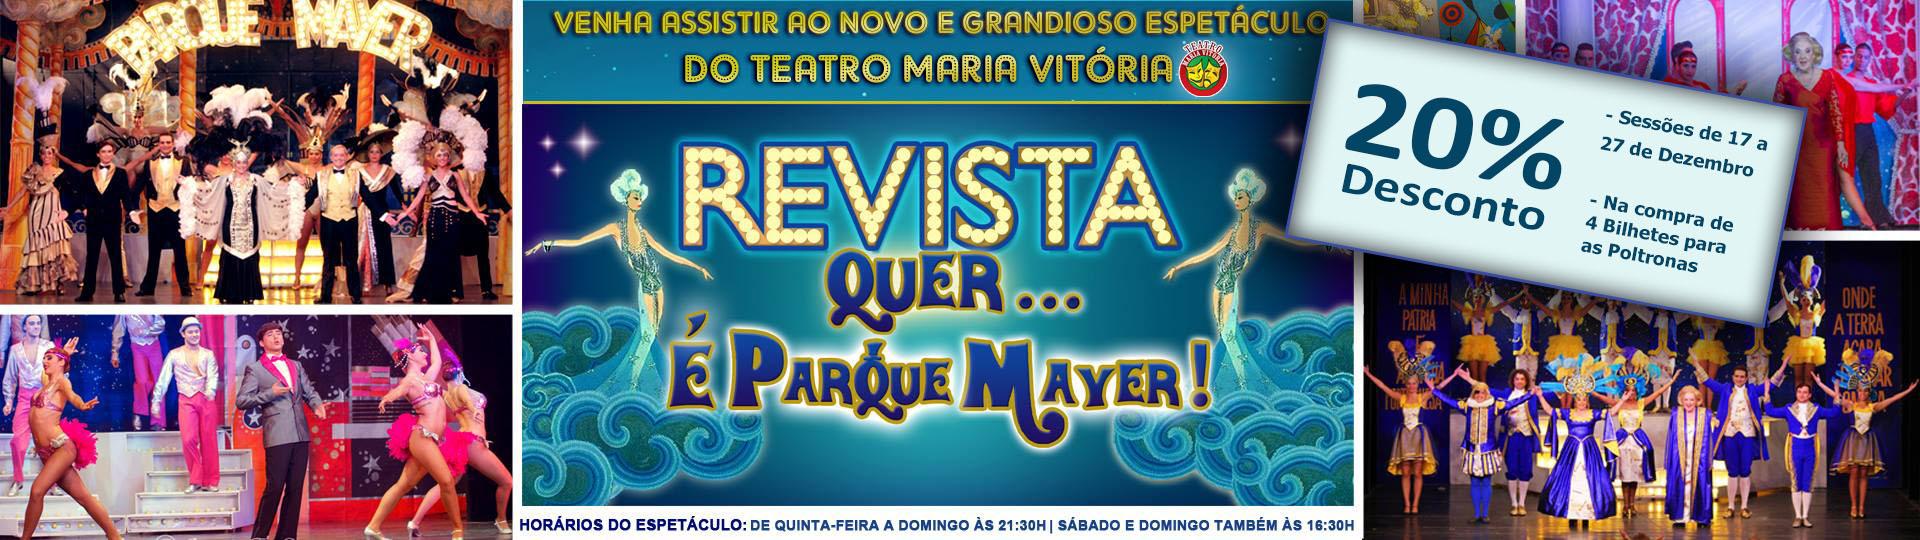 Revista Parque Mayer